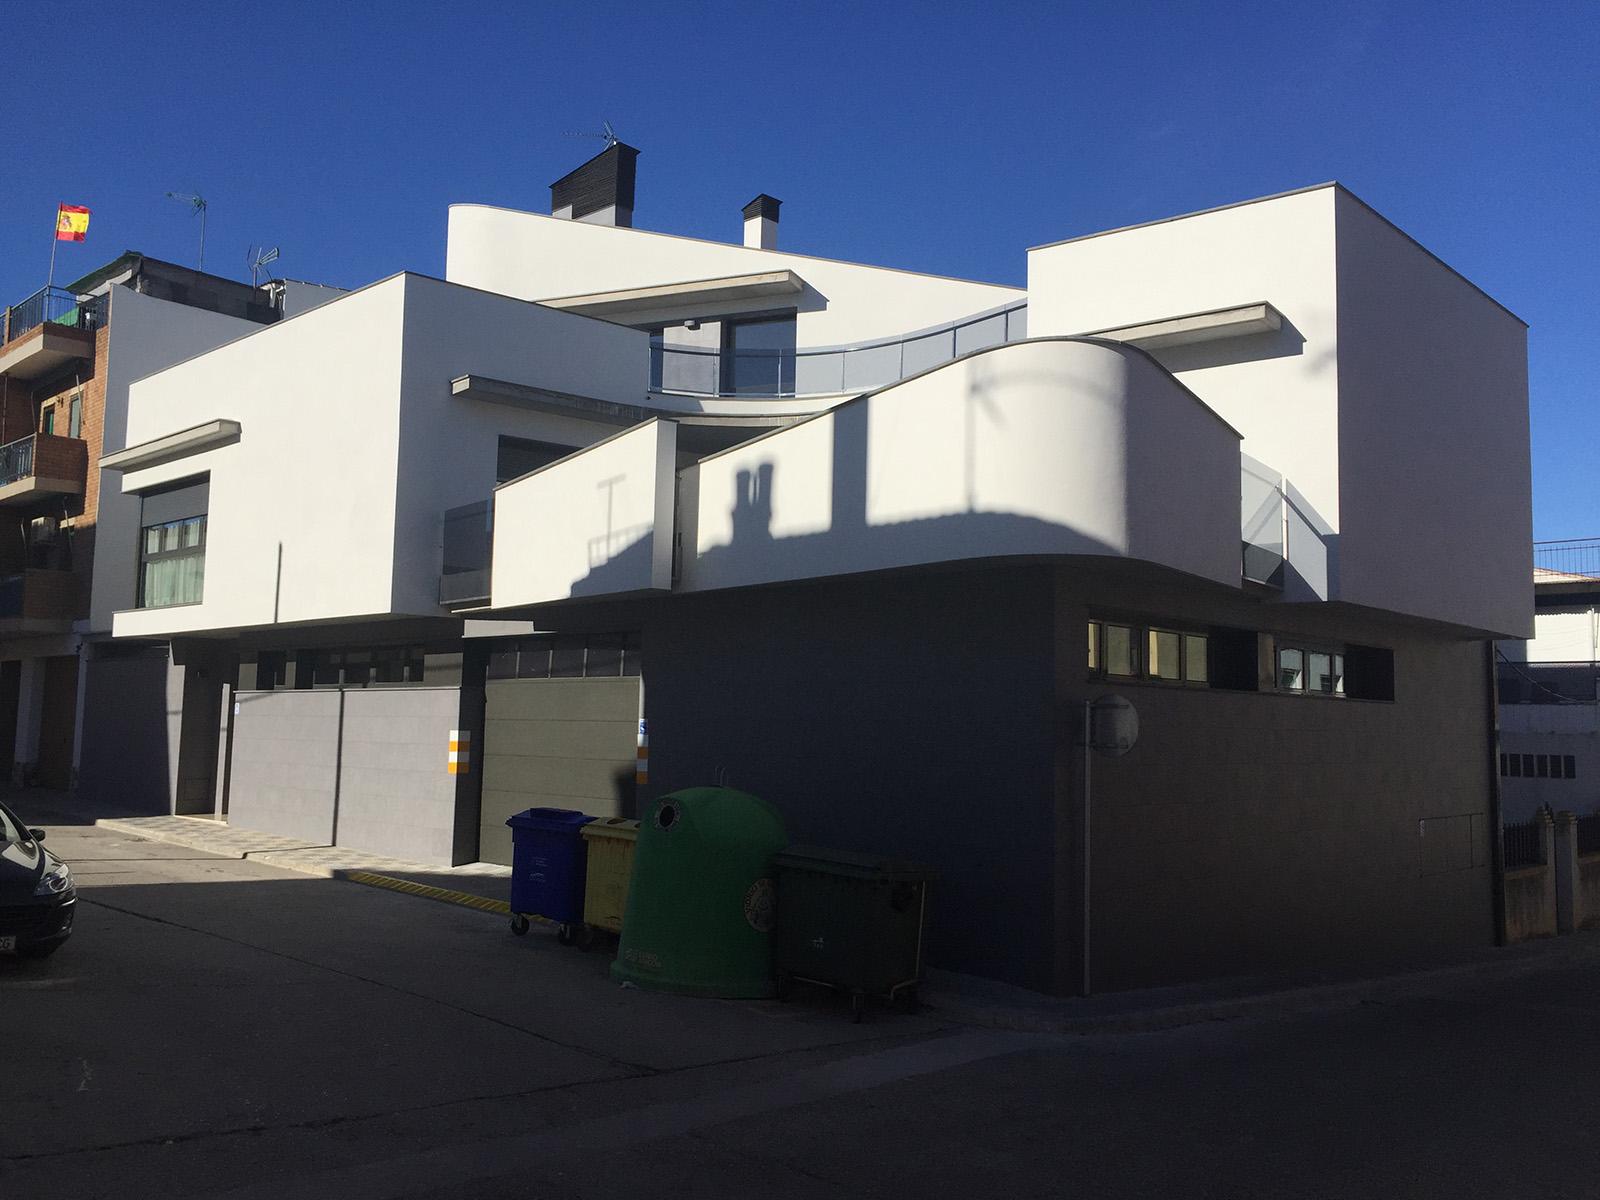 Galeria Casa en Binéfar, Huesca - 1 ?>